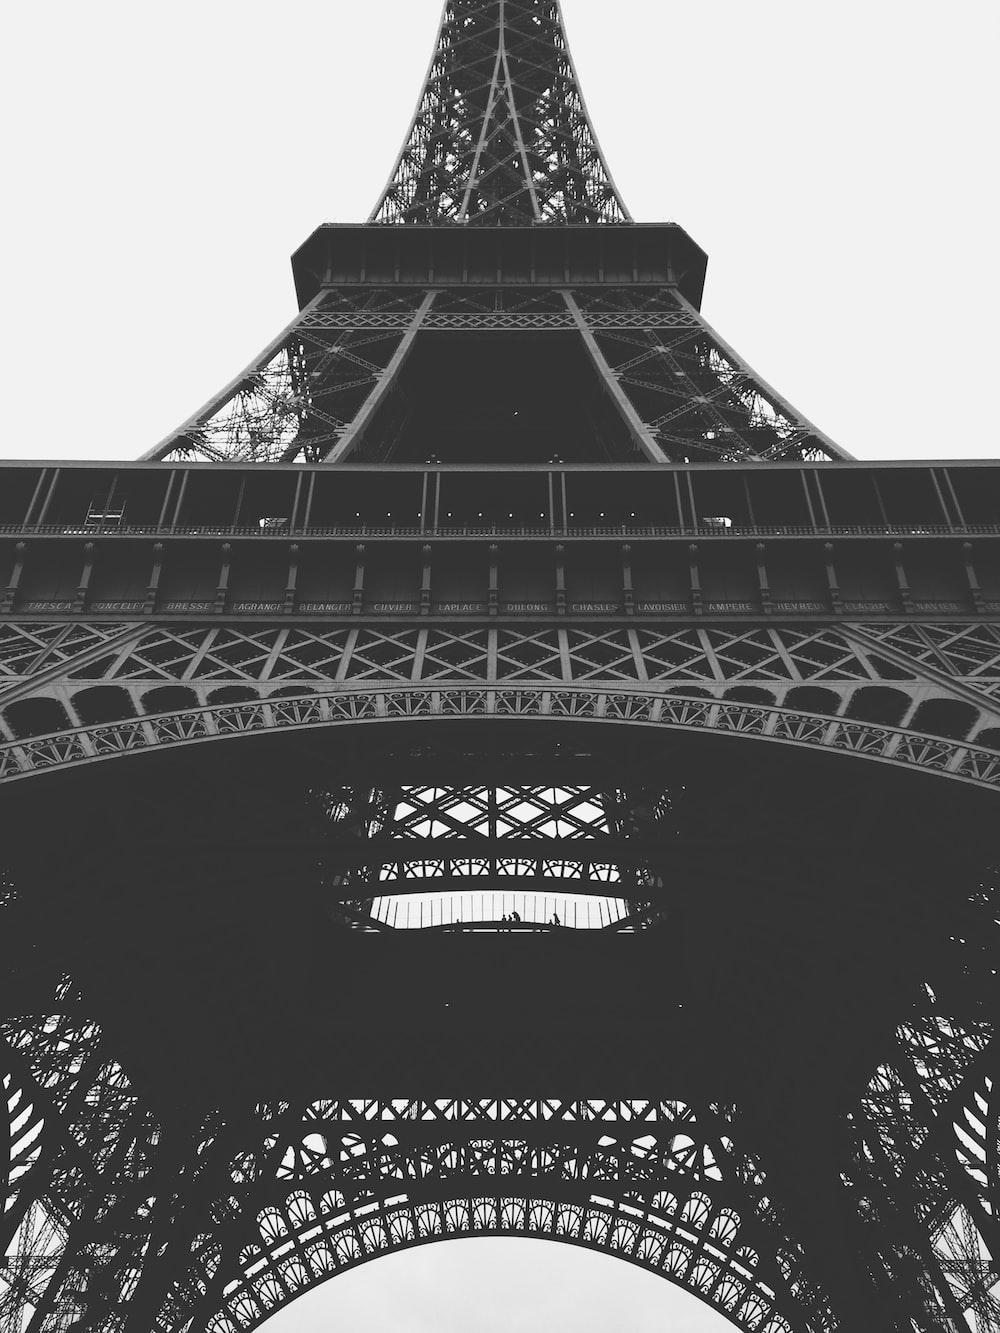 Eiffel Tower of Paris grayscale photo